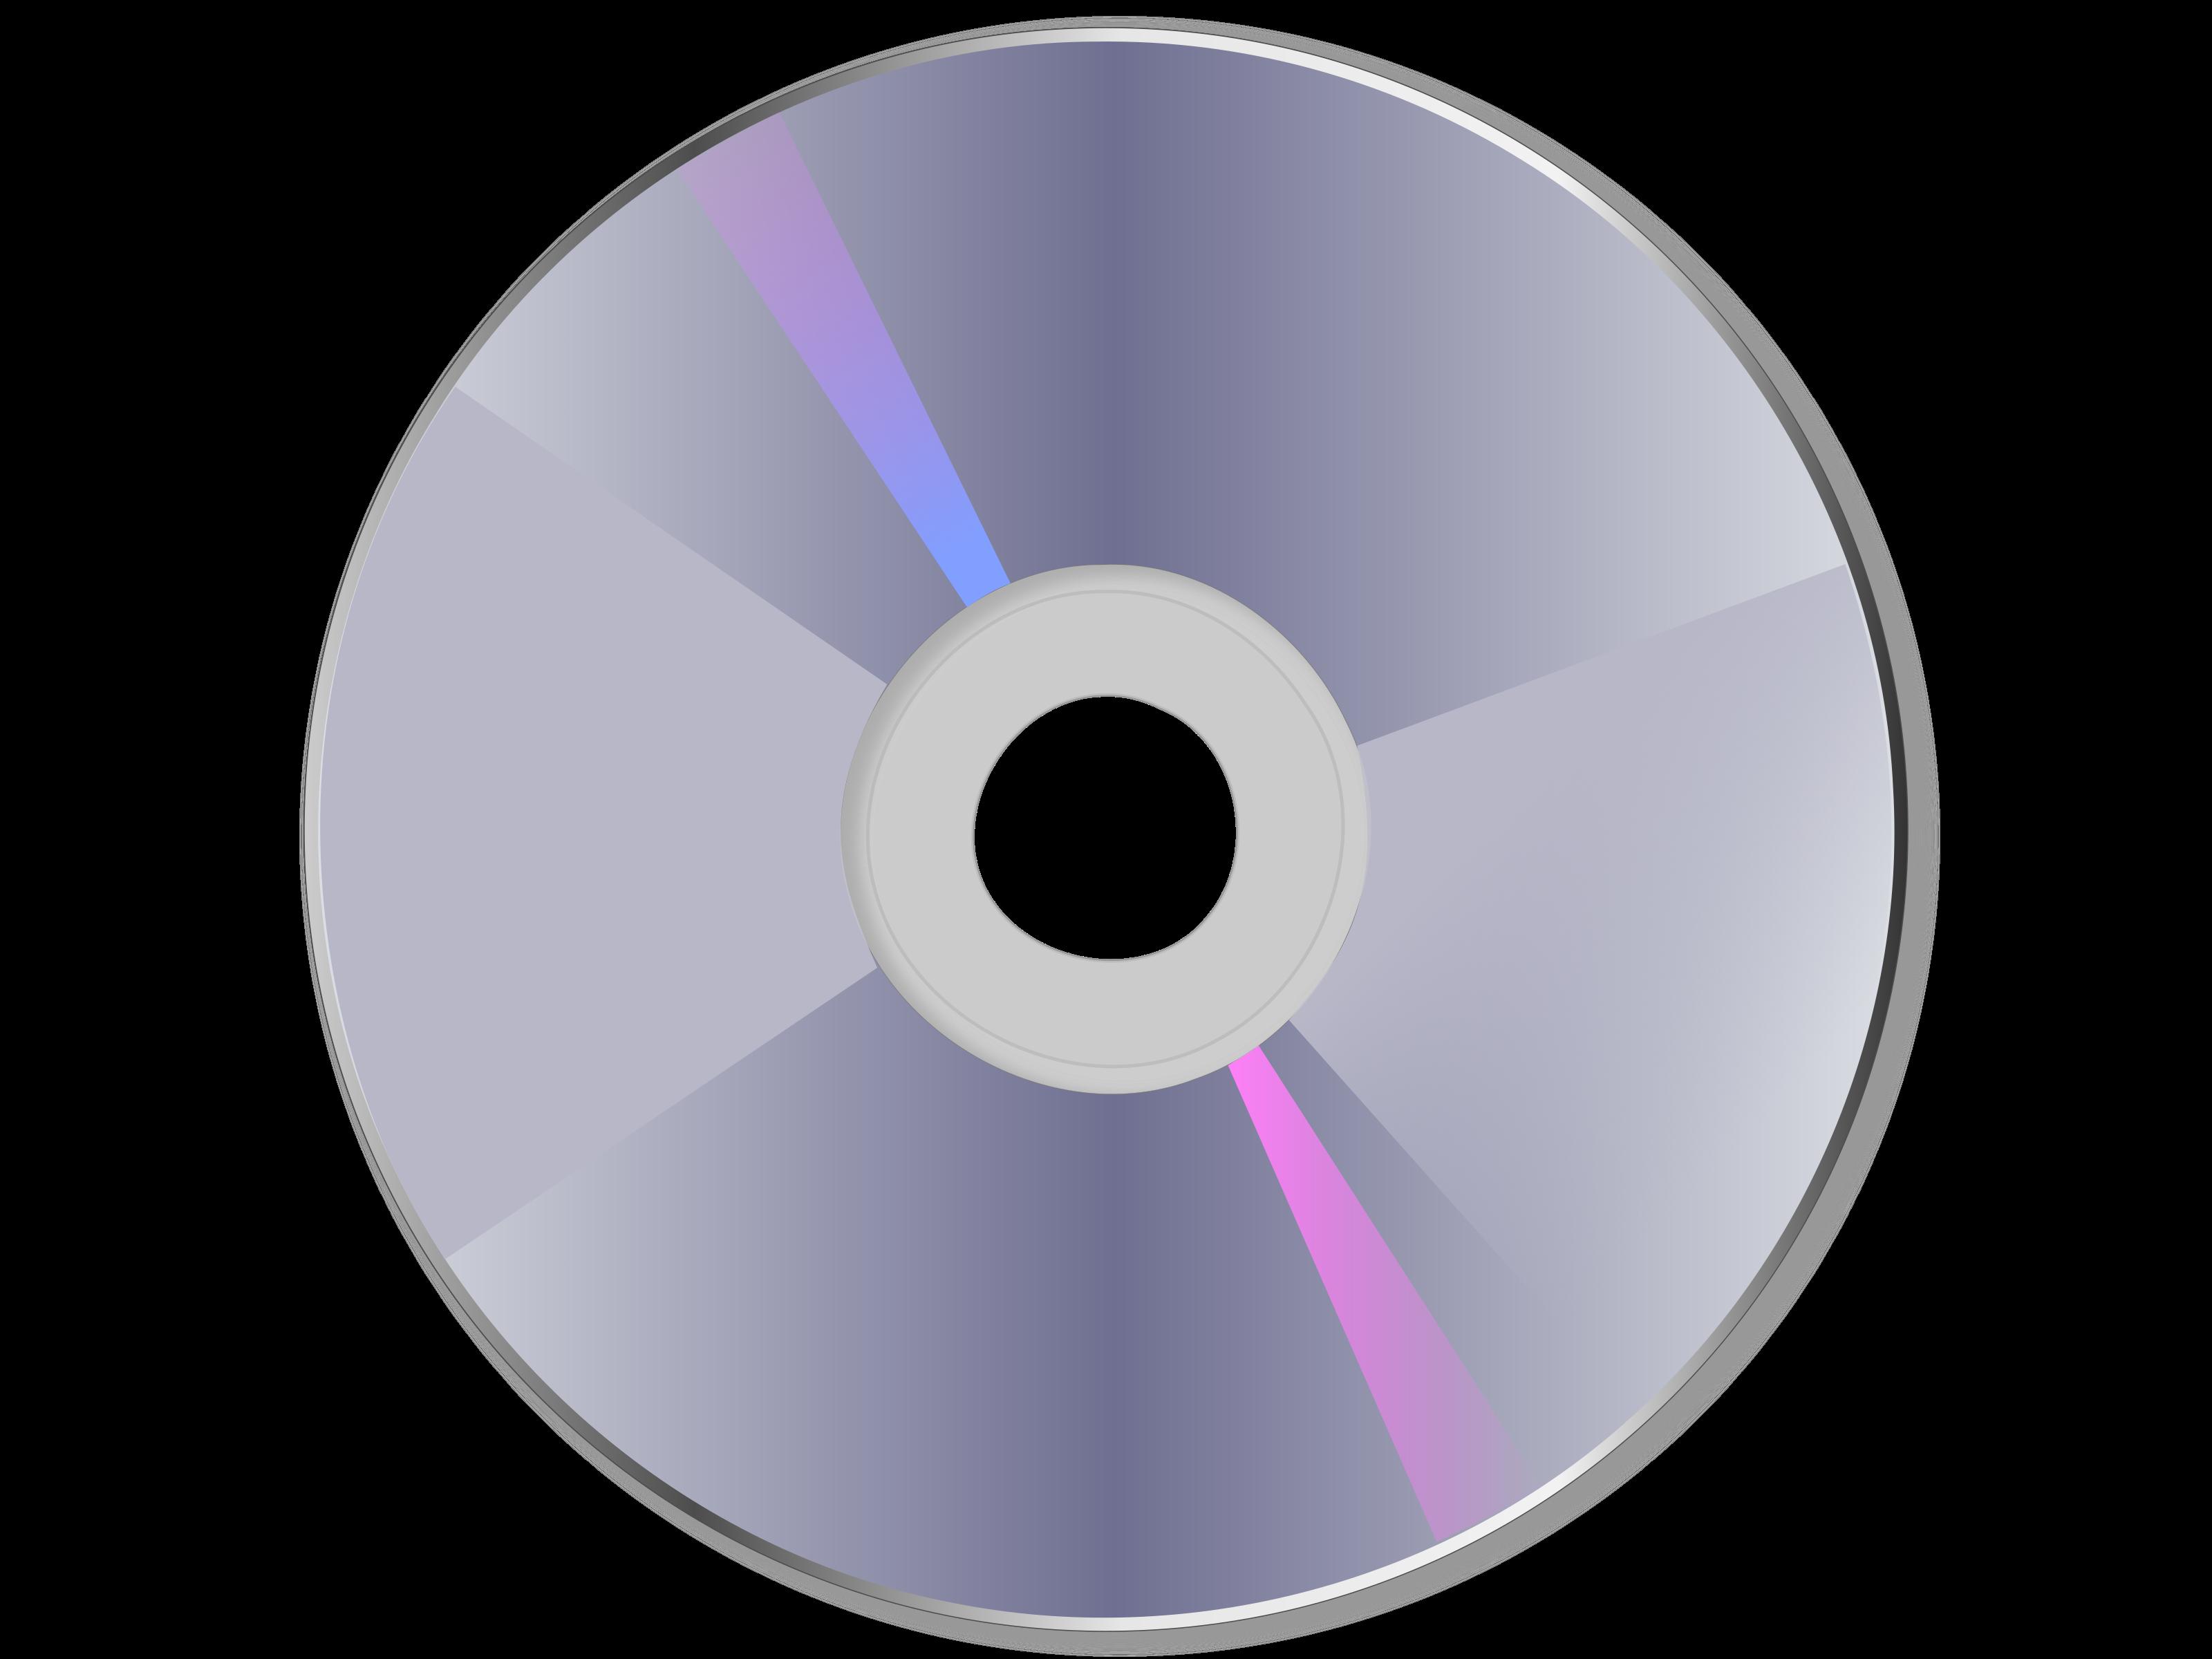 Cd cover clipart clipart transparent Clipart - Compact Disc clipart transparent